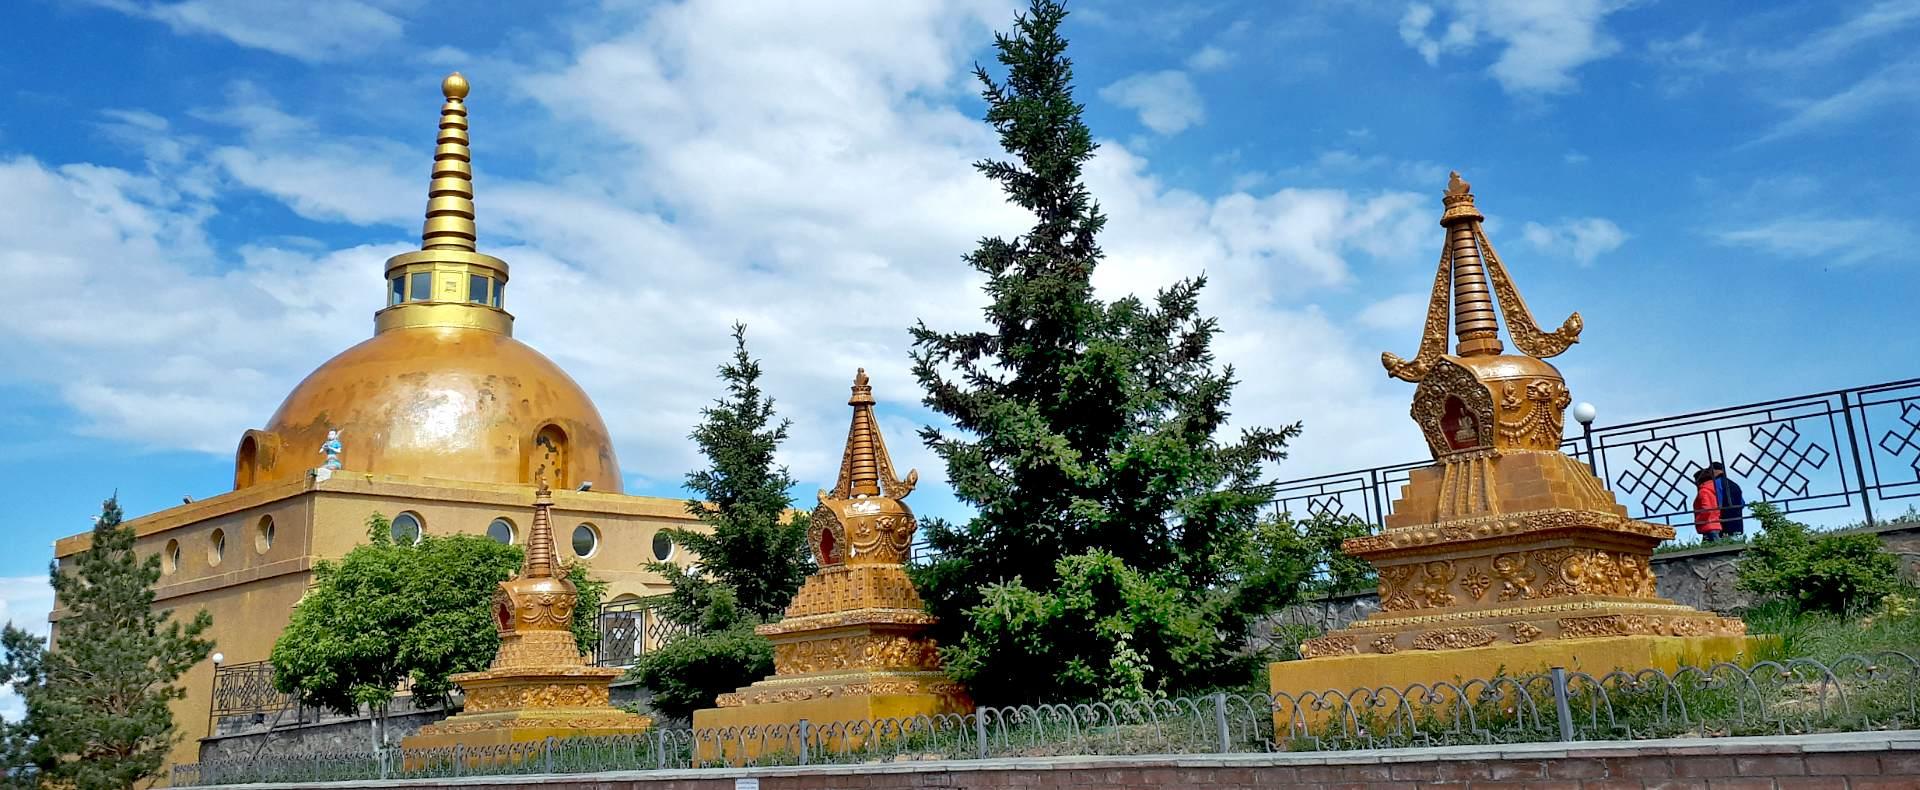 Ulan Ude, Russia